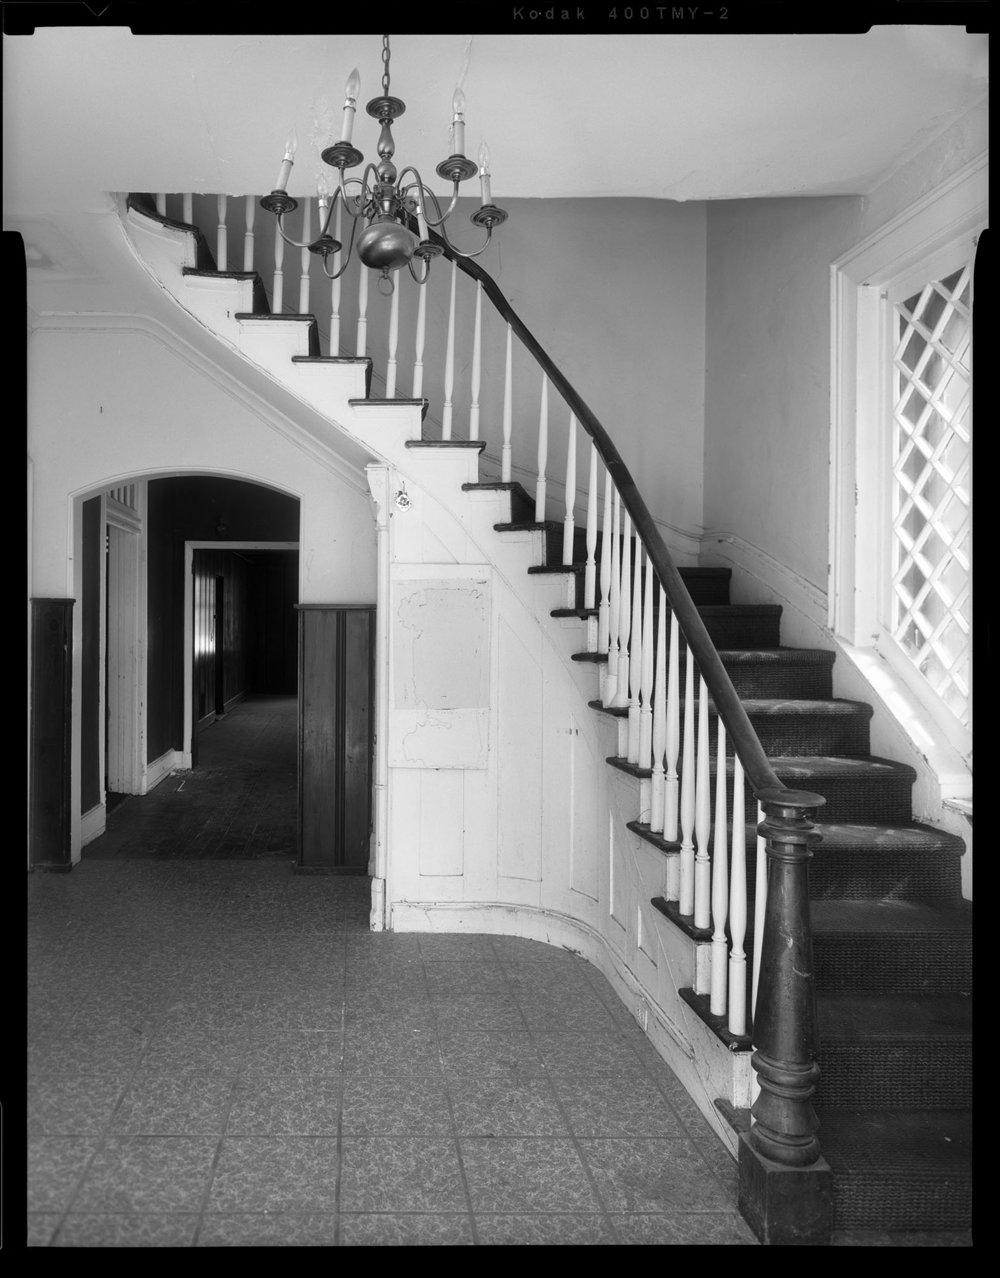 Entrance_Hall_from_Doorway.jpg